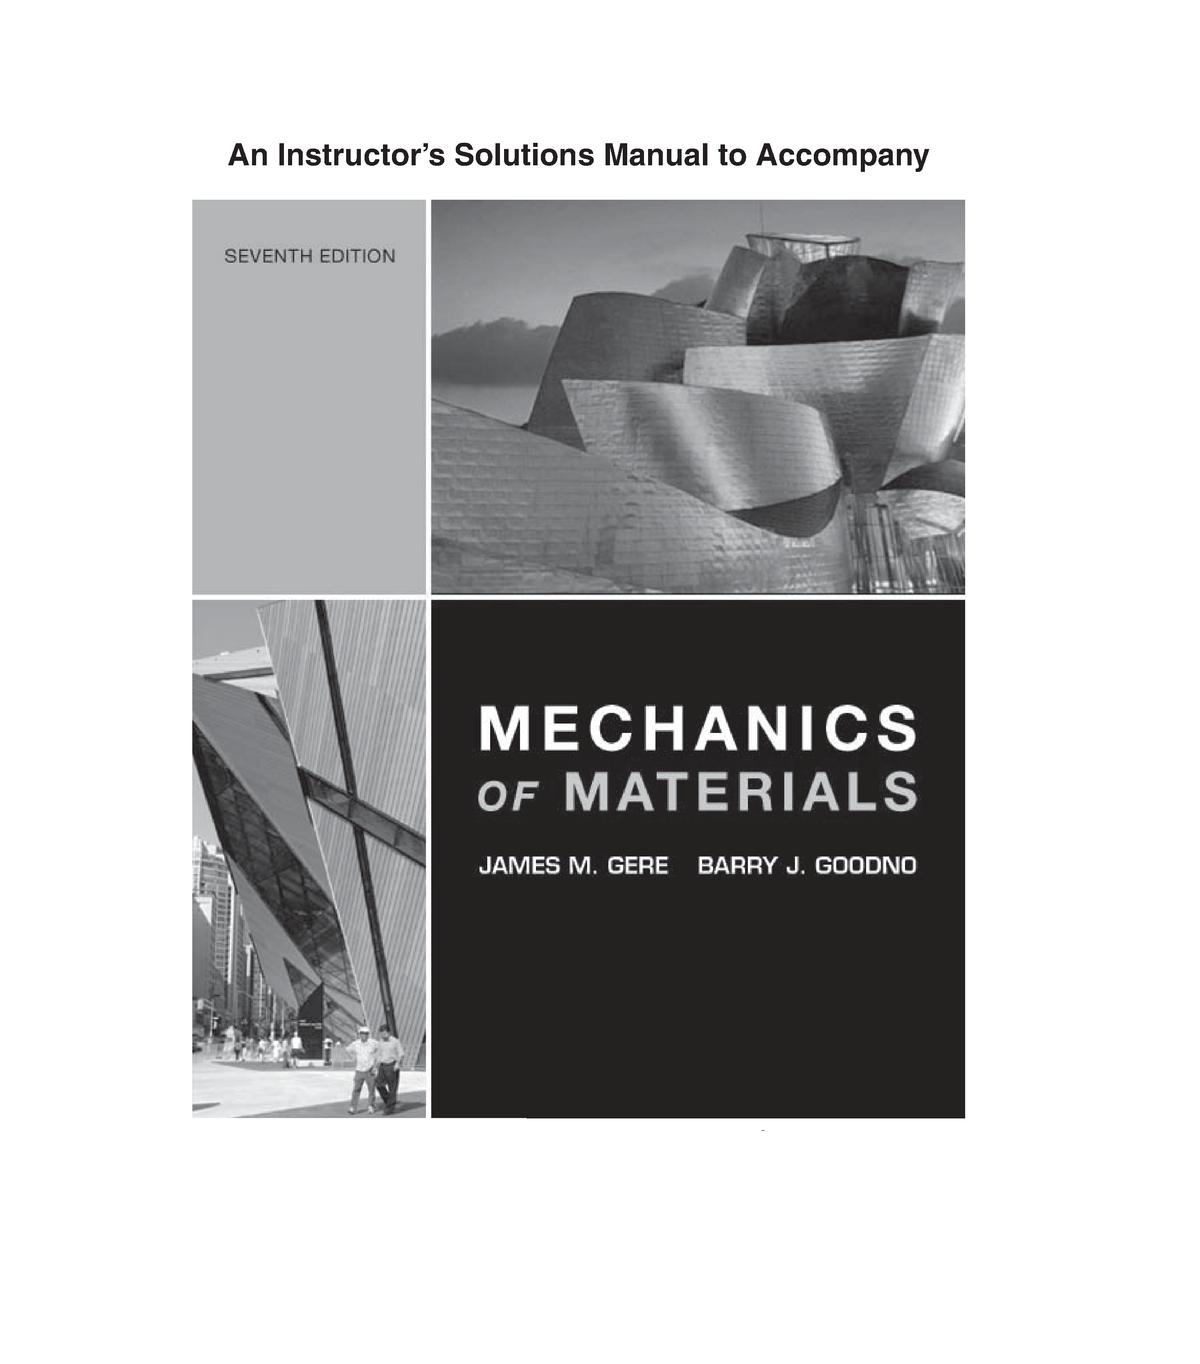 Solution Manual Mechanics Of Materials 7th Edition Gere Goodno Studocu